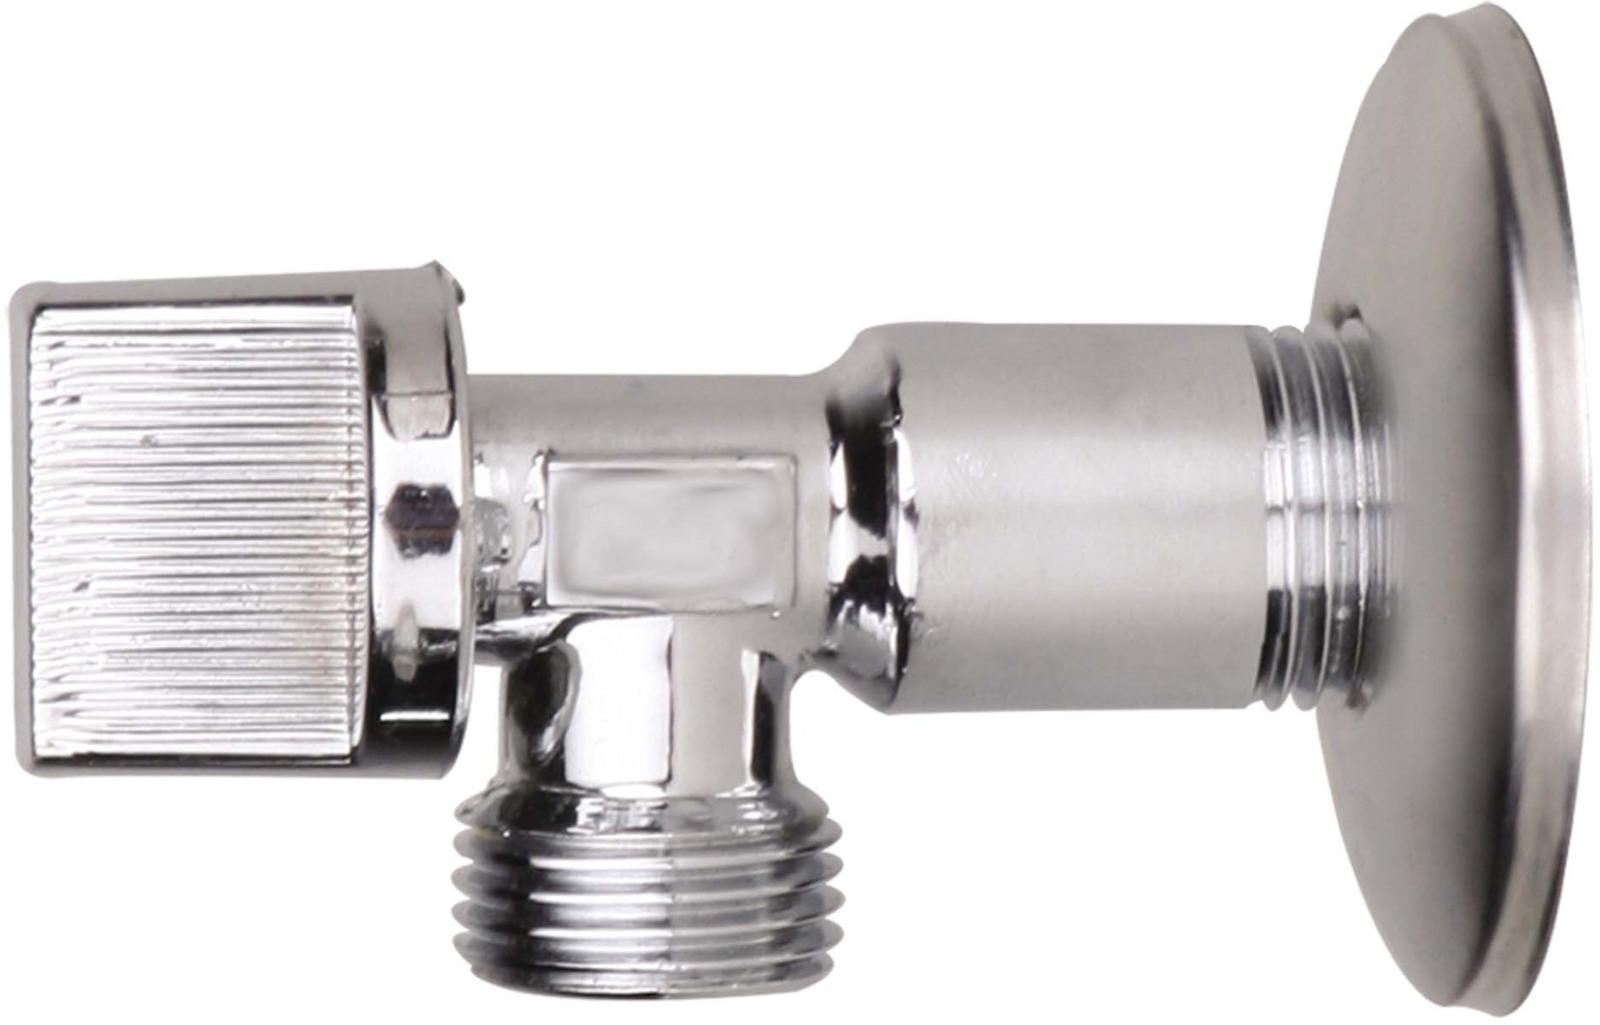 Кран шаровый MasterProf, 1/2х1/2 (тип 86) н/н (хром), 264, MP-У кран шаровый masterprof ис 080033 водоразборный со штуцером 1 2 ручка mp у